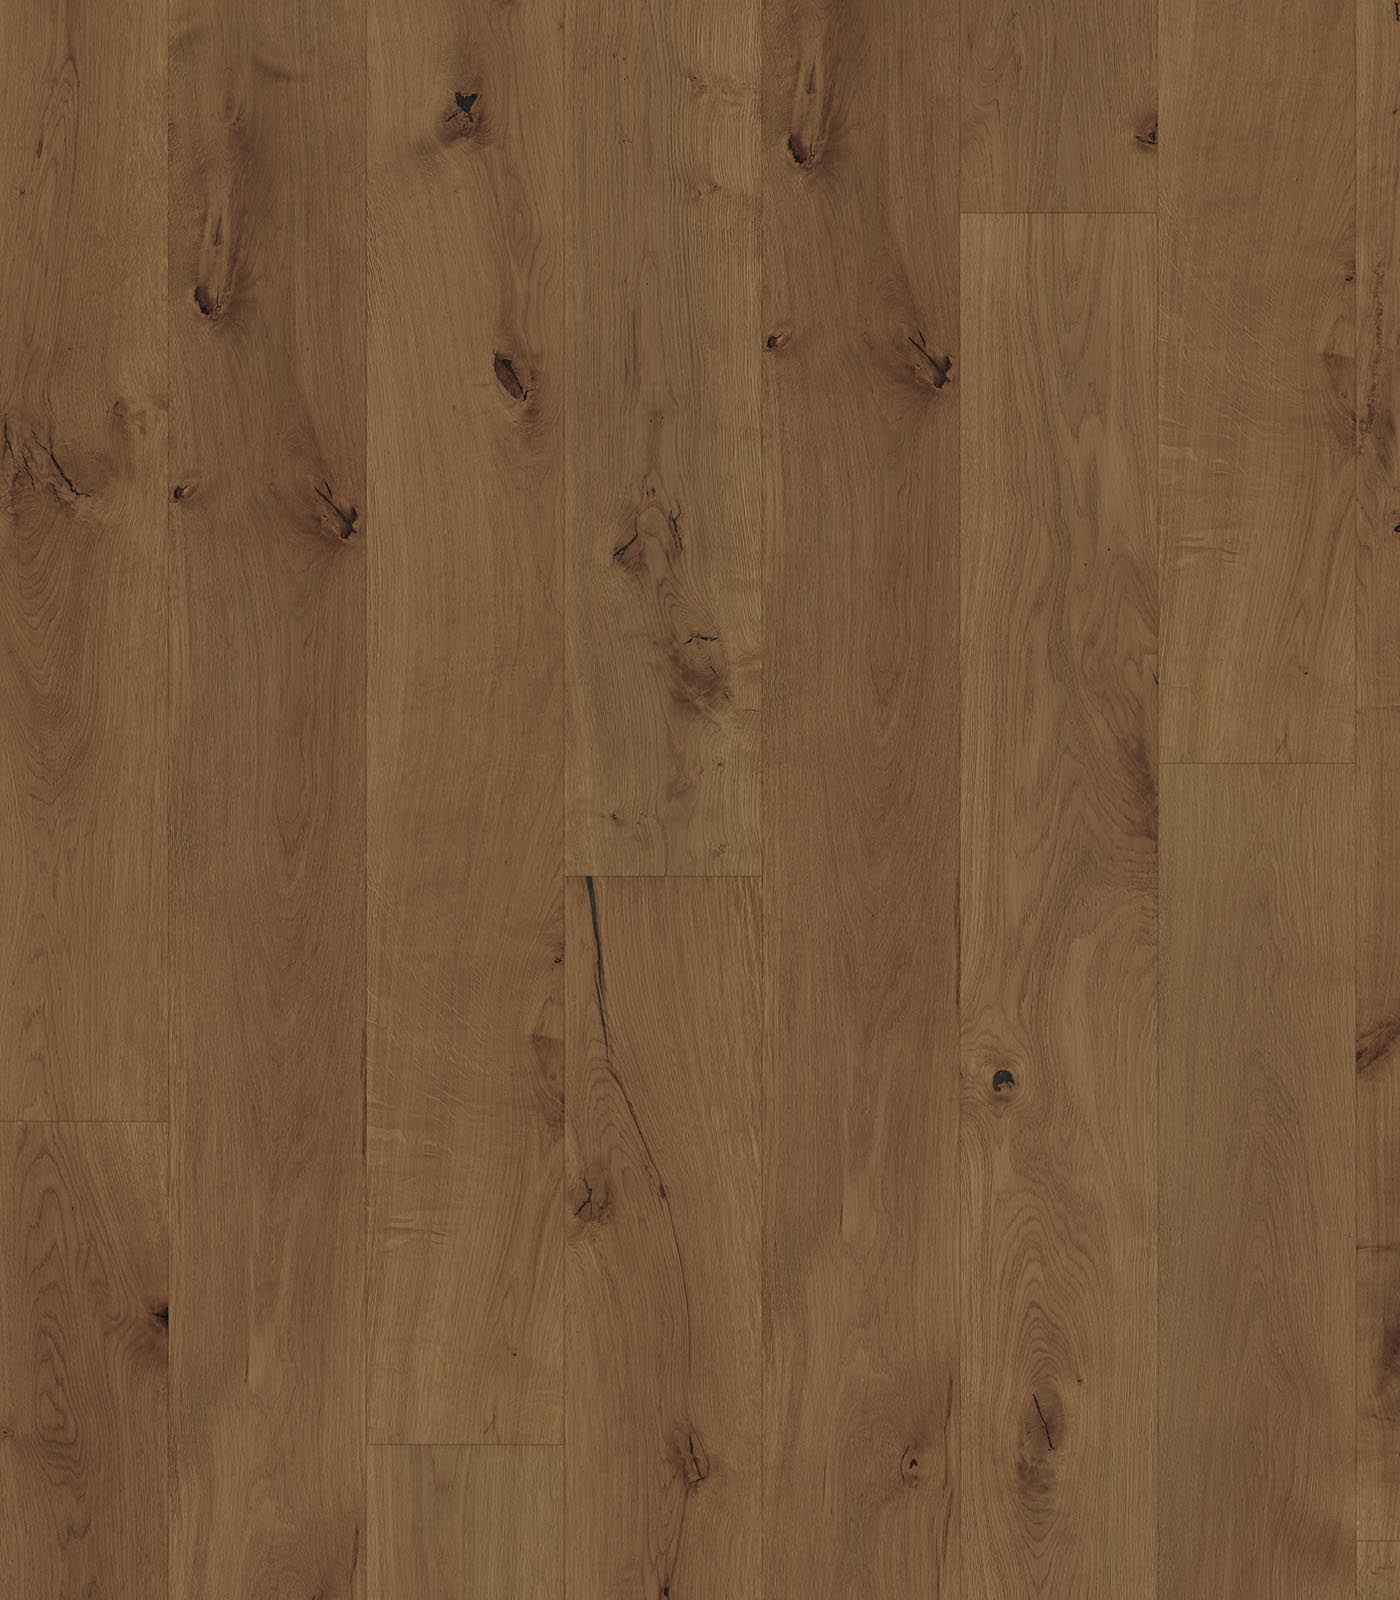 Mykonos-Engineered European Oak floors